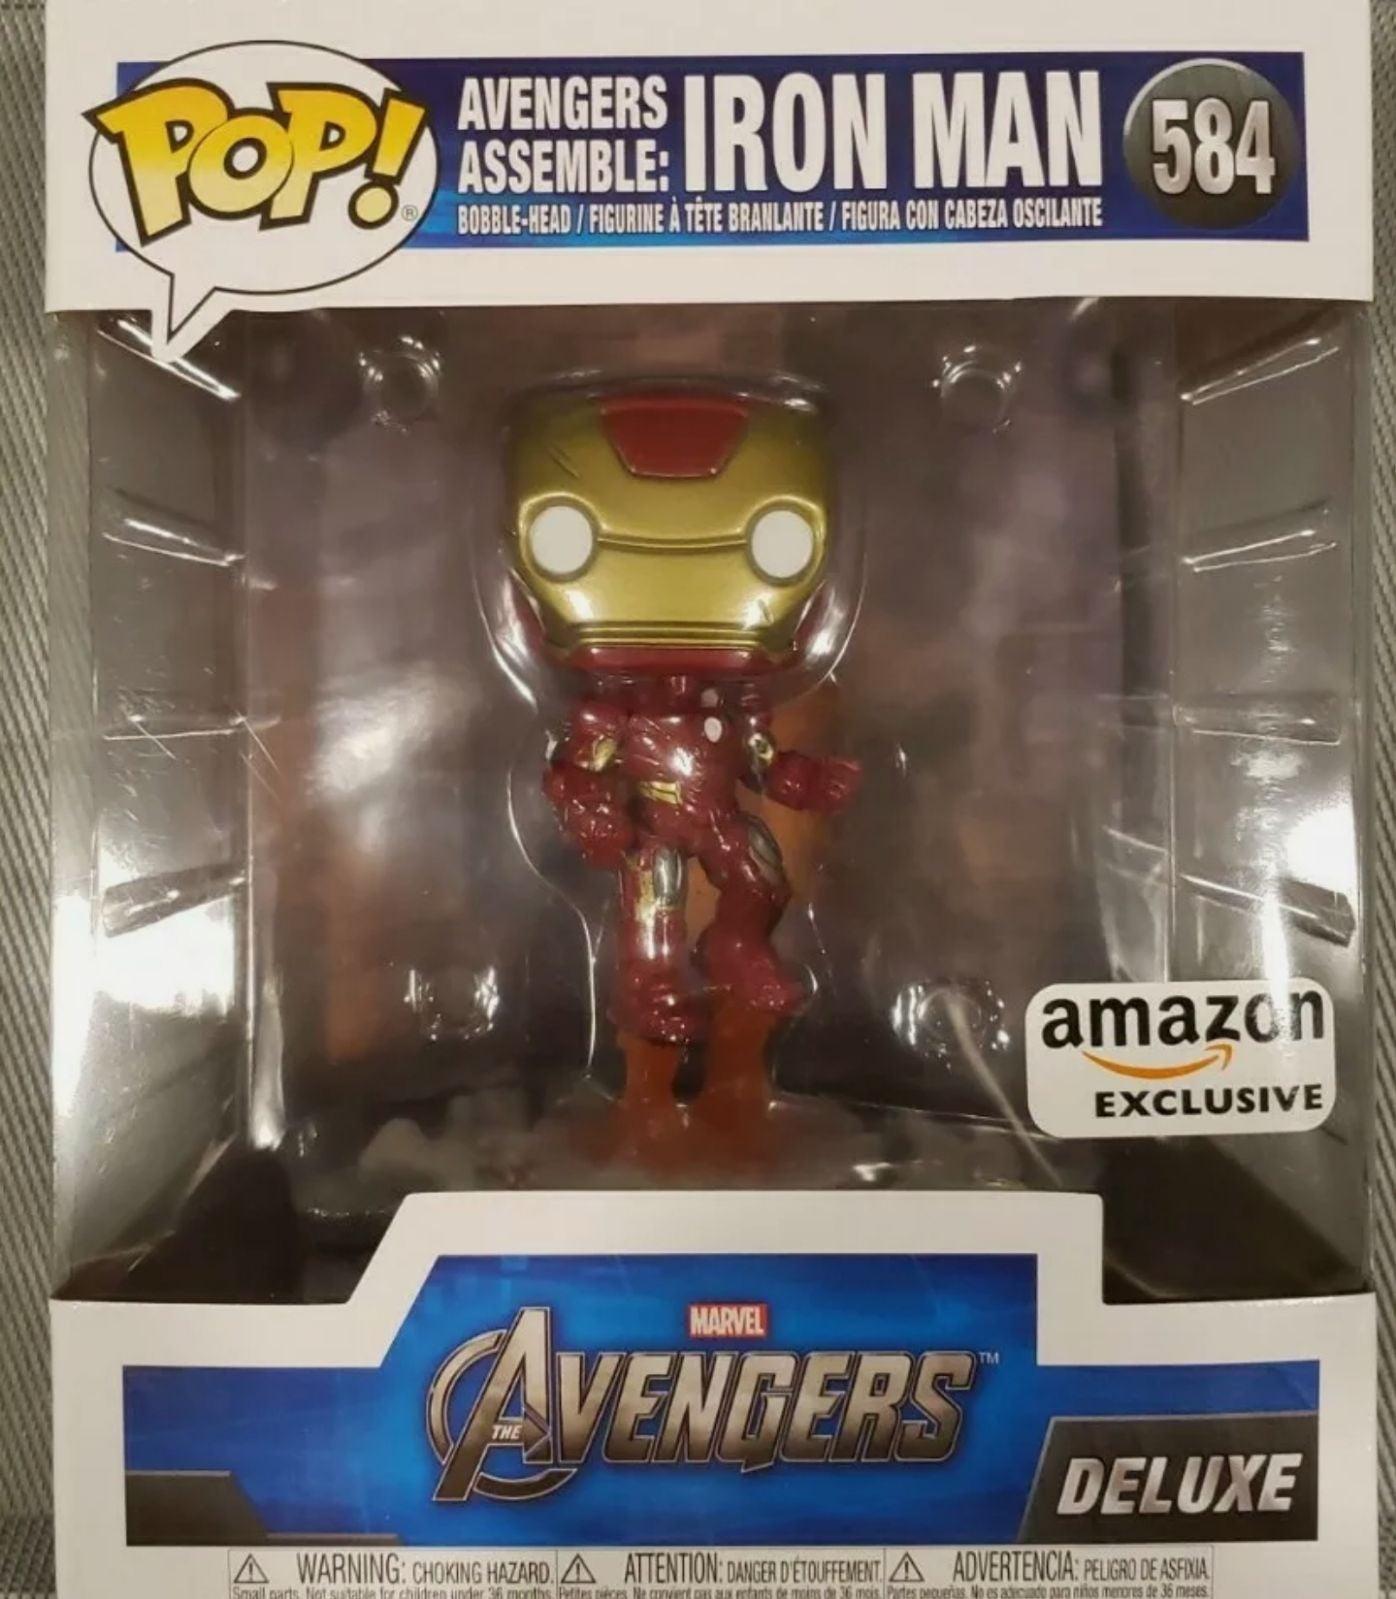 Avengers Assemble Iron Man Deluxe Funko